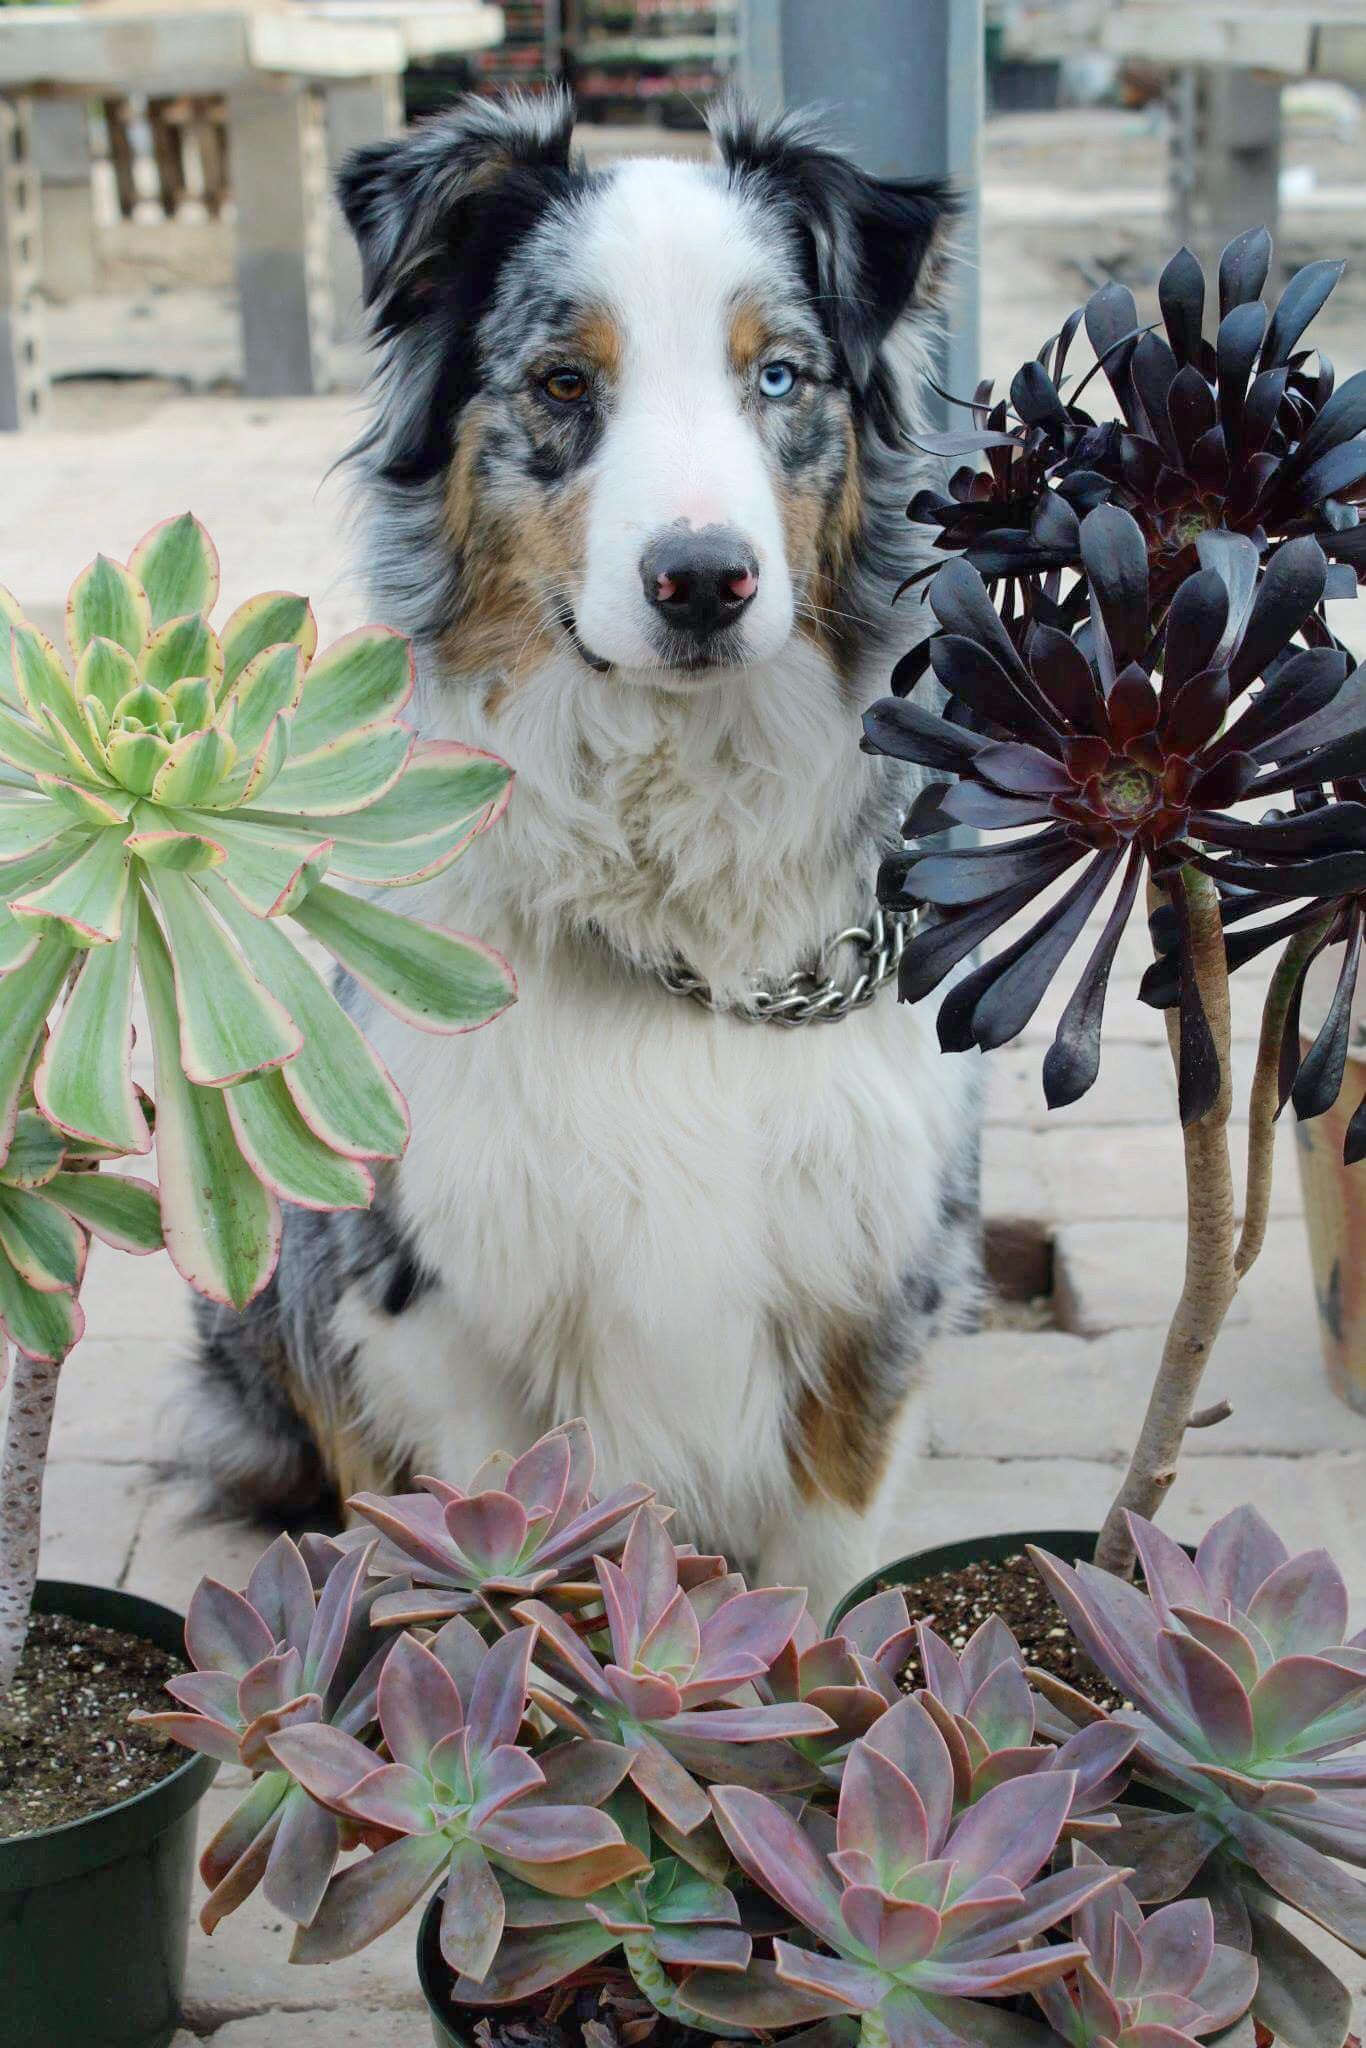 Mini Aussie Size Comparison : aussie, comparison, These, Aeoniums, Started, Succulent, Addiction., Aussie, Comparison, Wasn't, Awkward, Puppy, 😂), Succulents